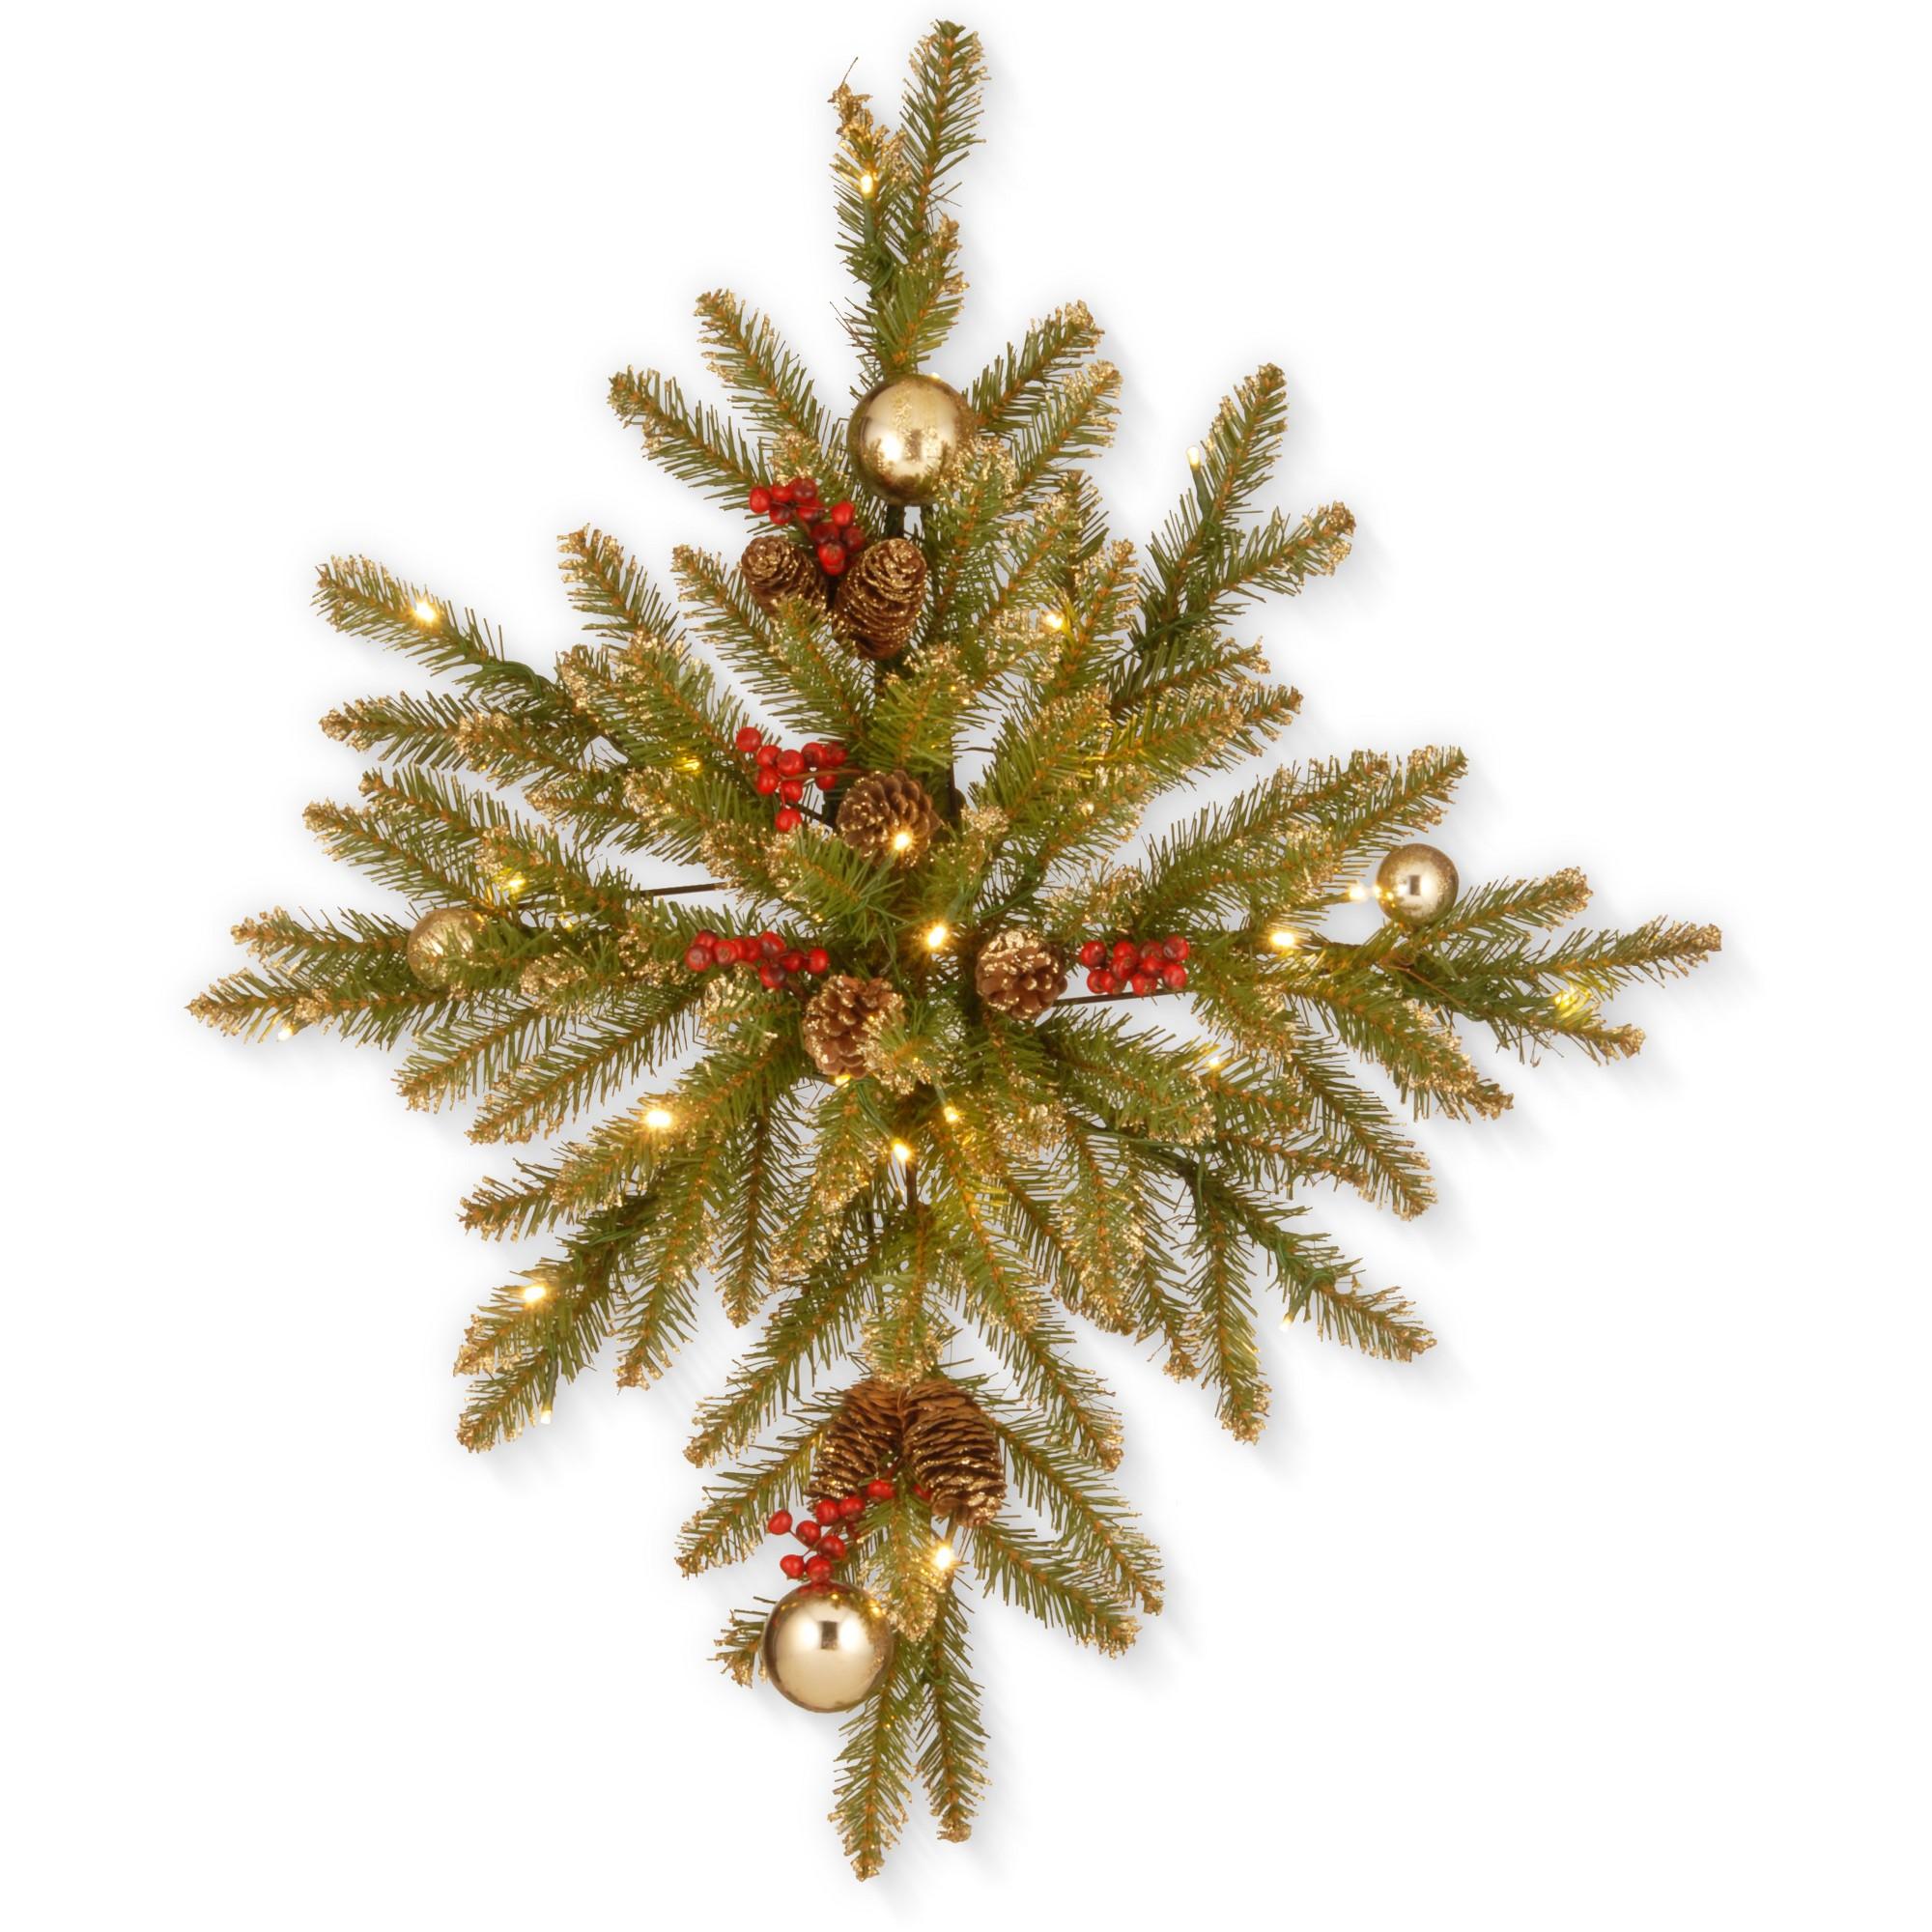 32 Glittery Gold Dunhill Fir Bethlehem Star with Battery